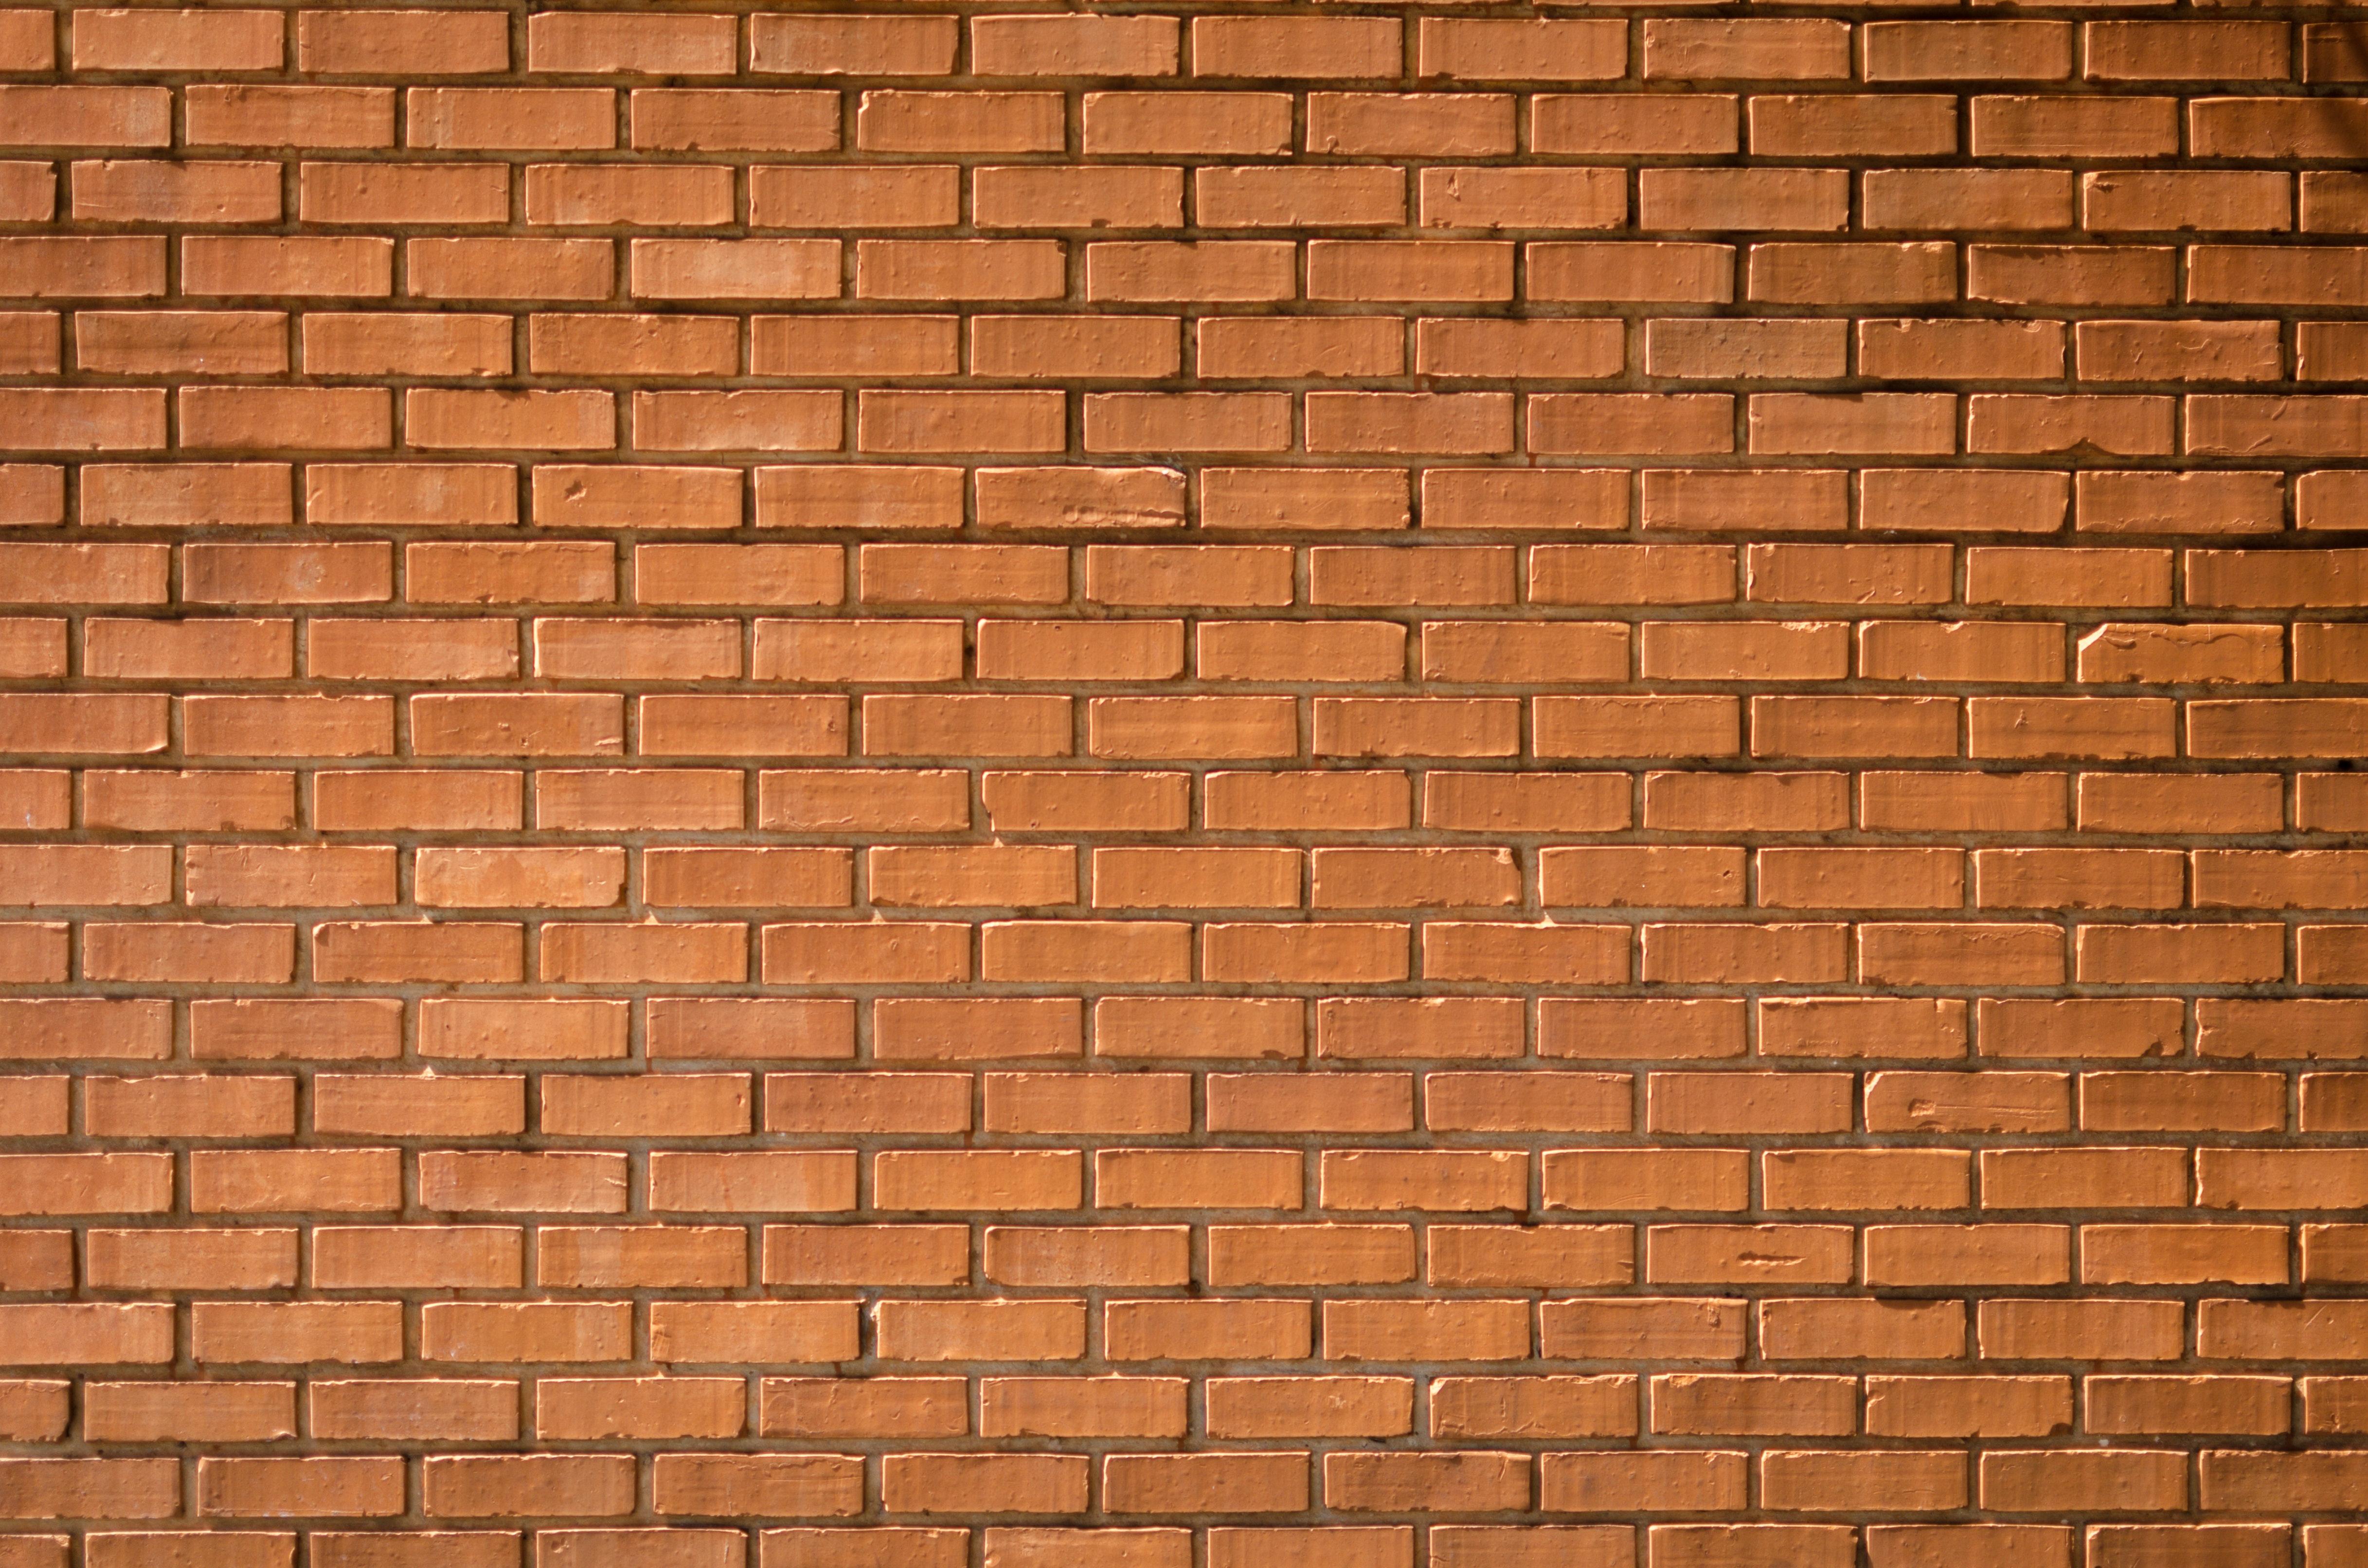 1000+ Interesting Brick Wall Photos · Pexels · Free Stock Photos